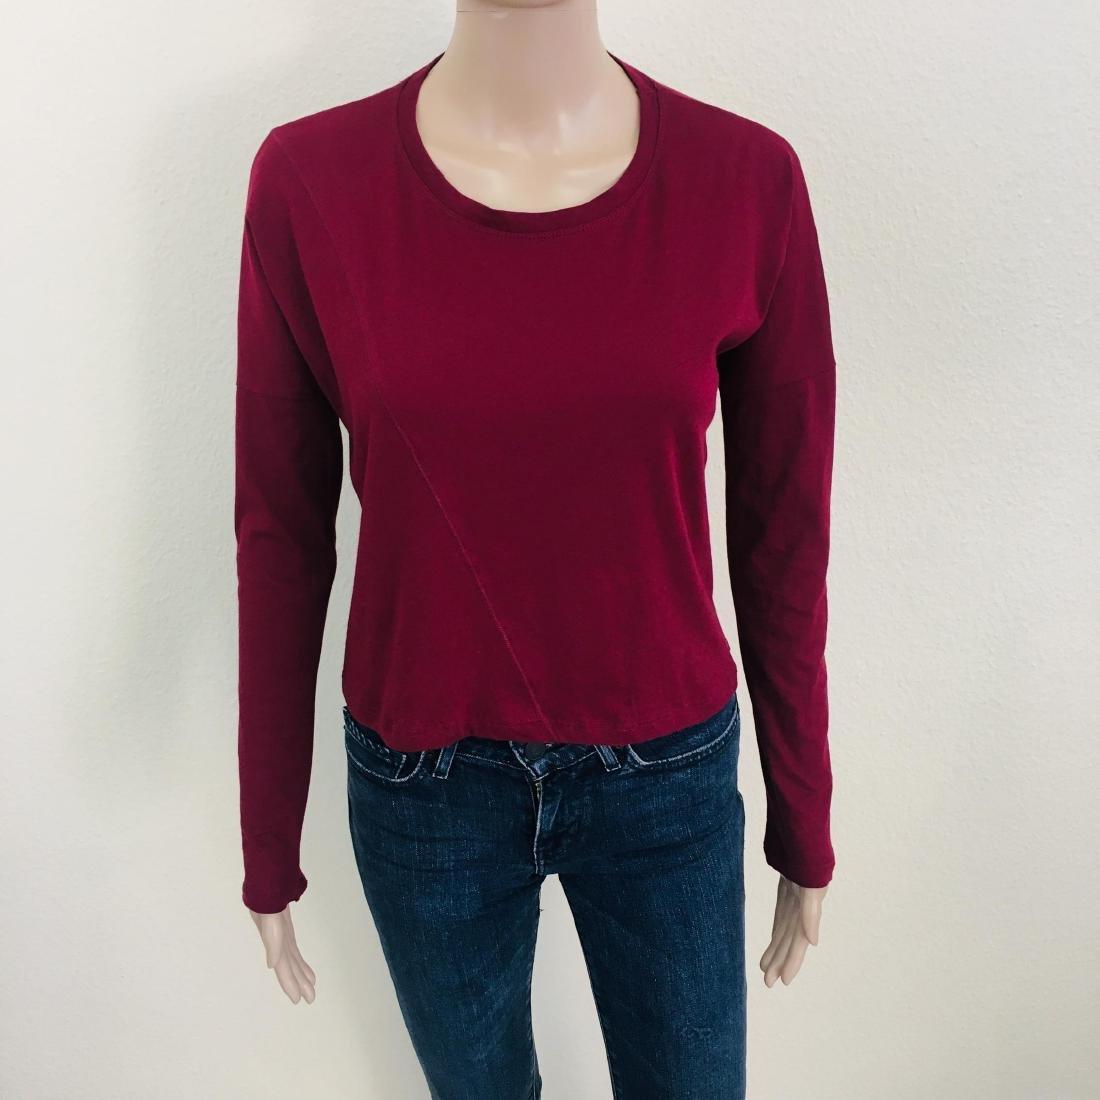 New Women's ZARA Top Blouse Size S - 4